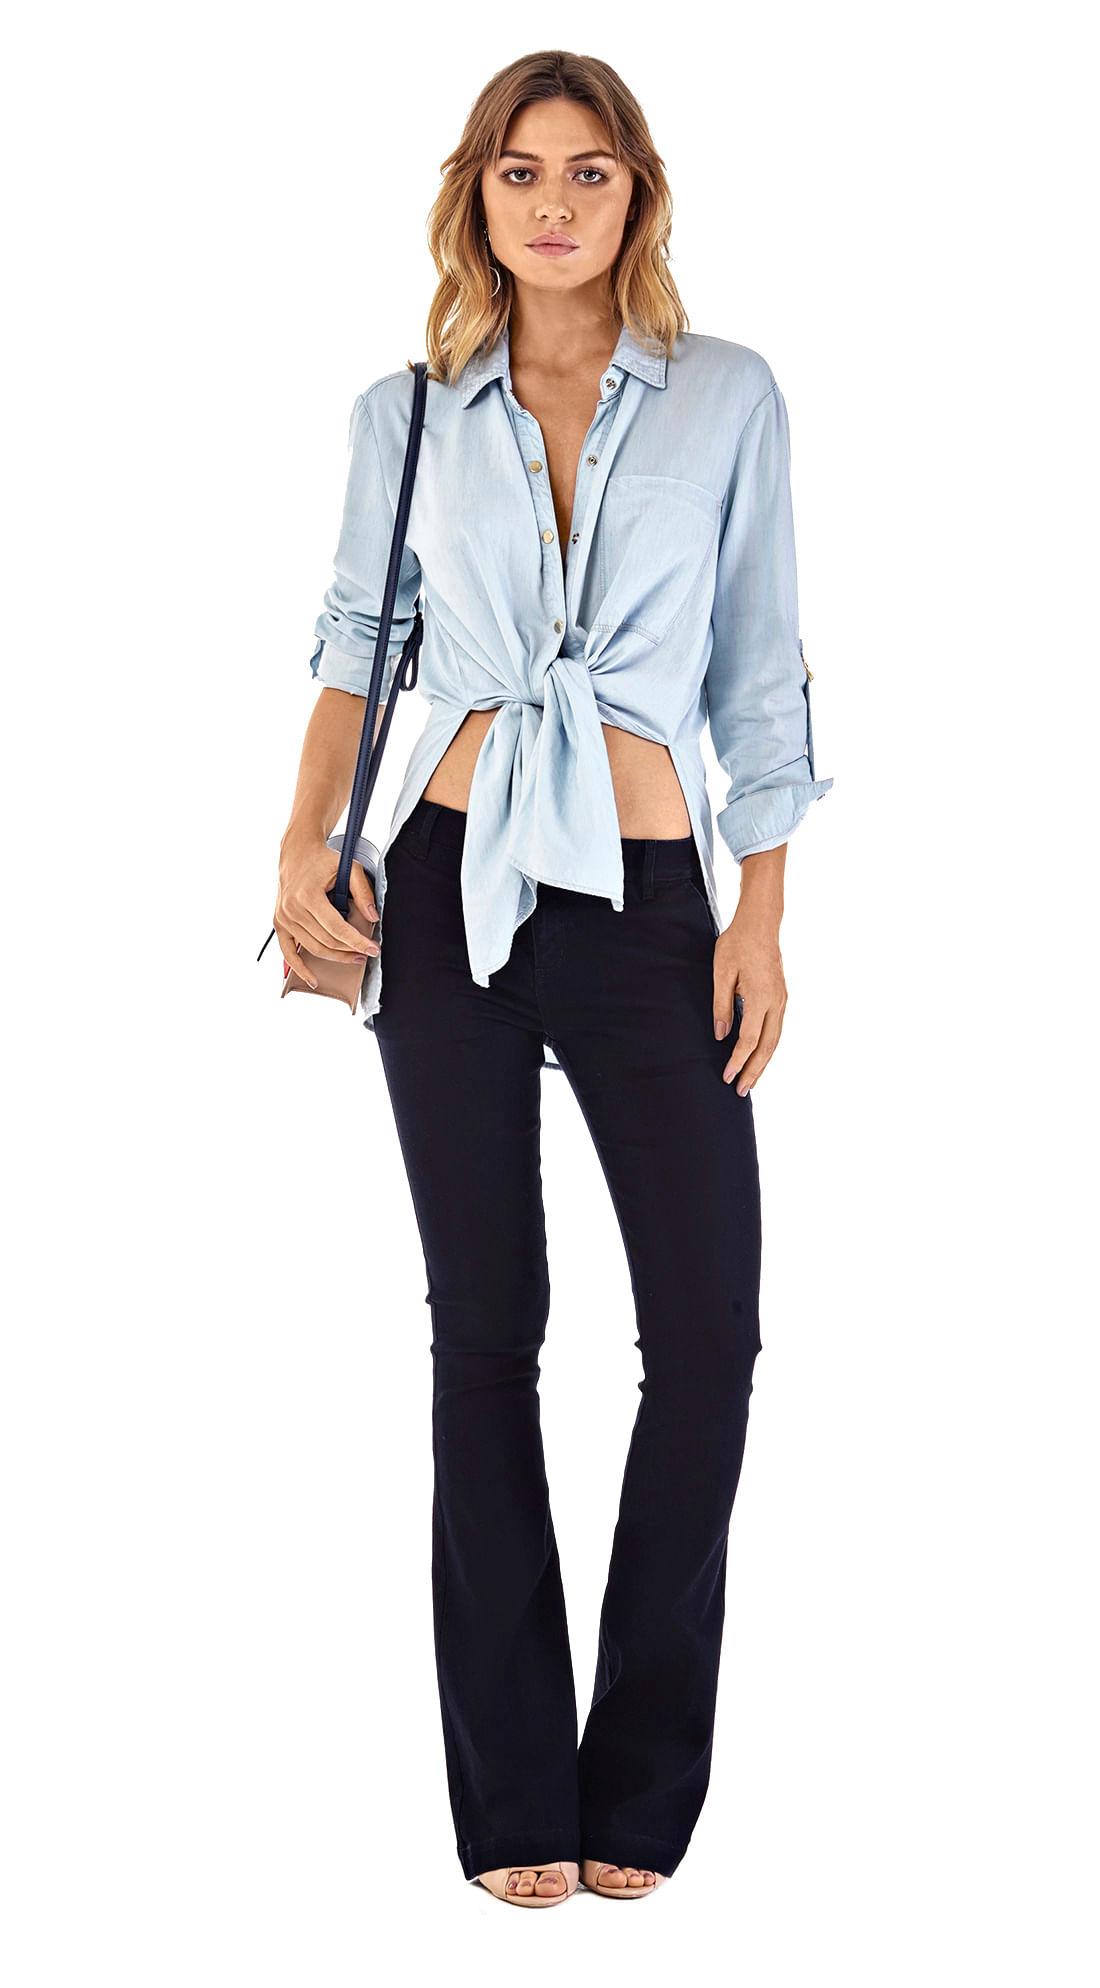 b3d07fb36dabe4 Calca Boot Cut Carol Cos Intermediario Bolso Faca Jeans - morenarosa